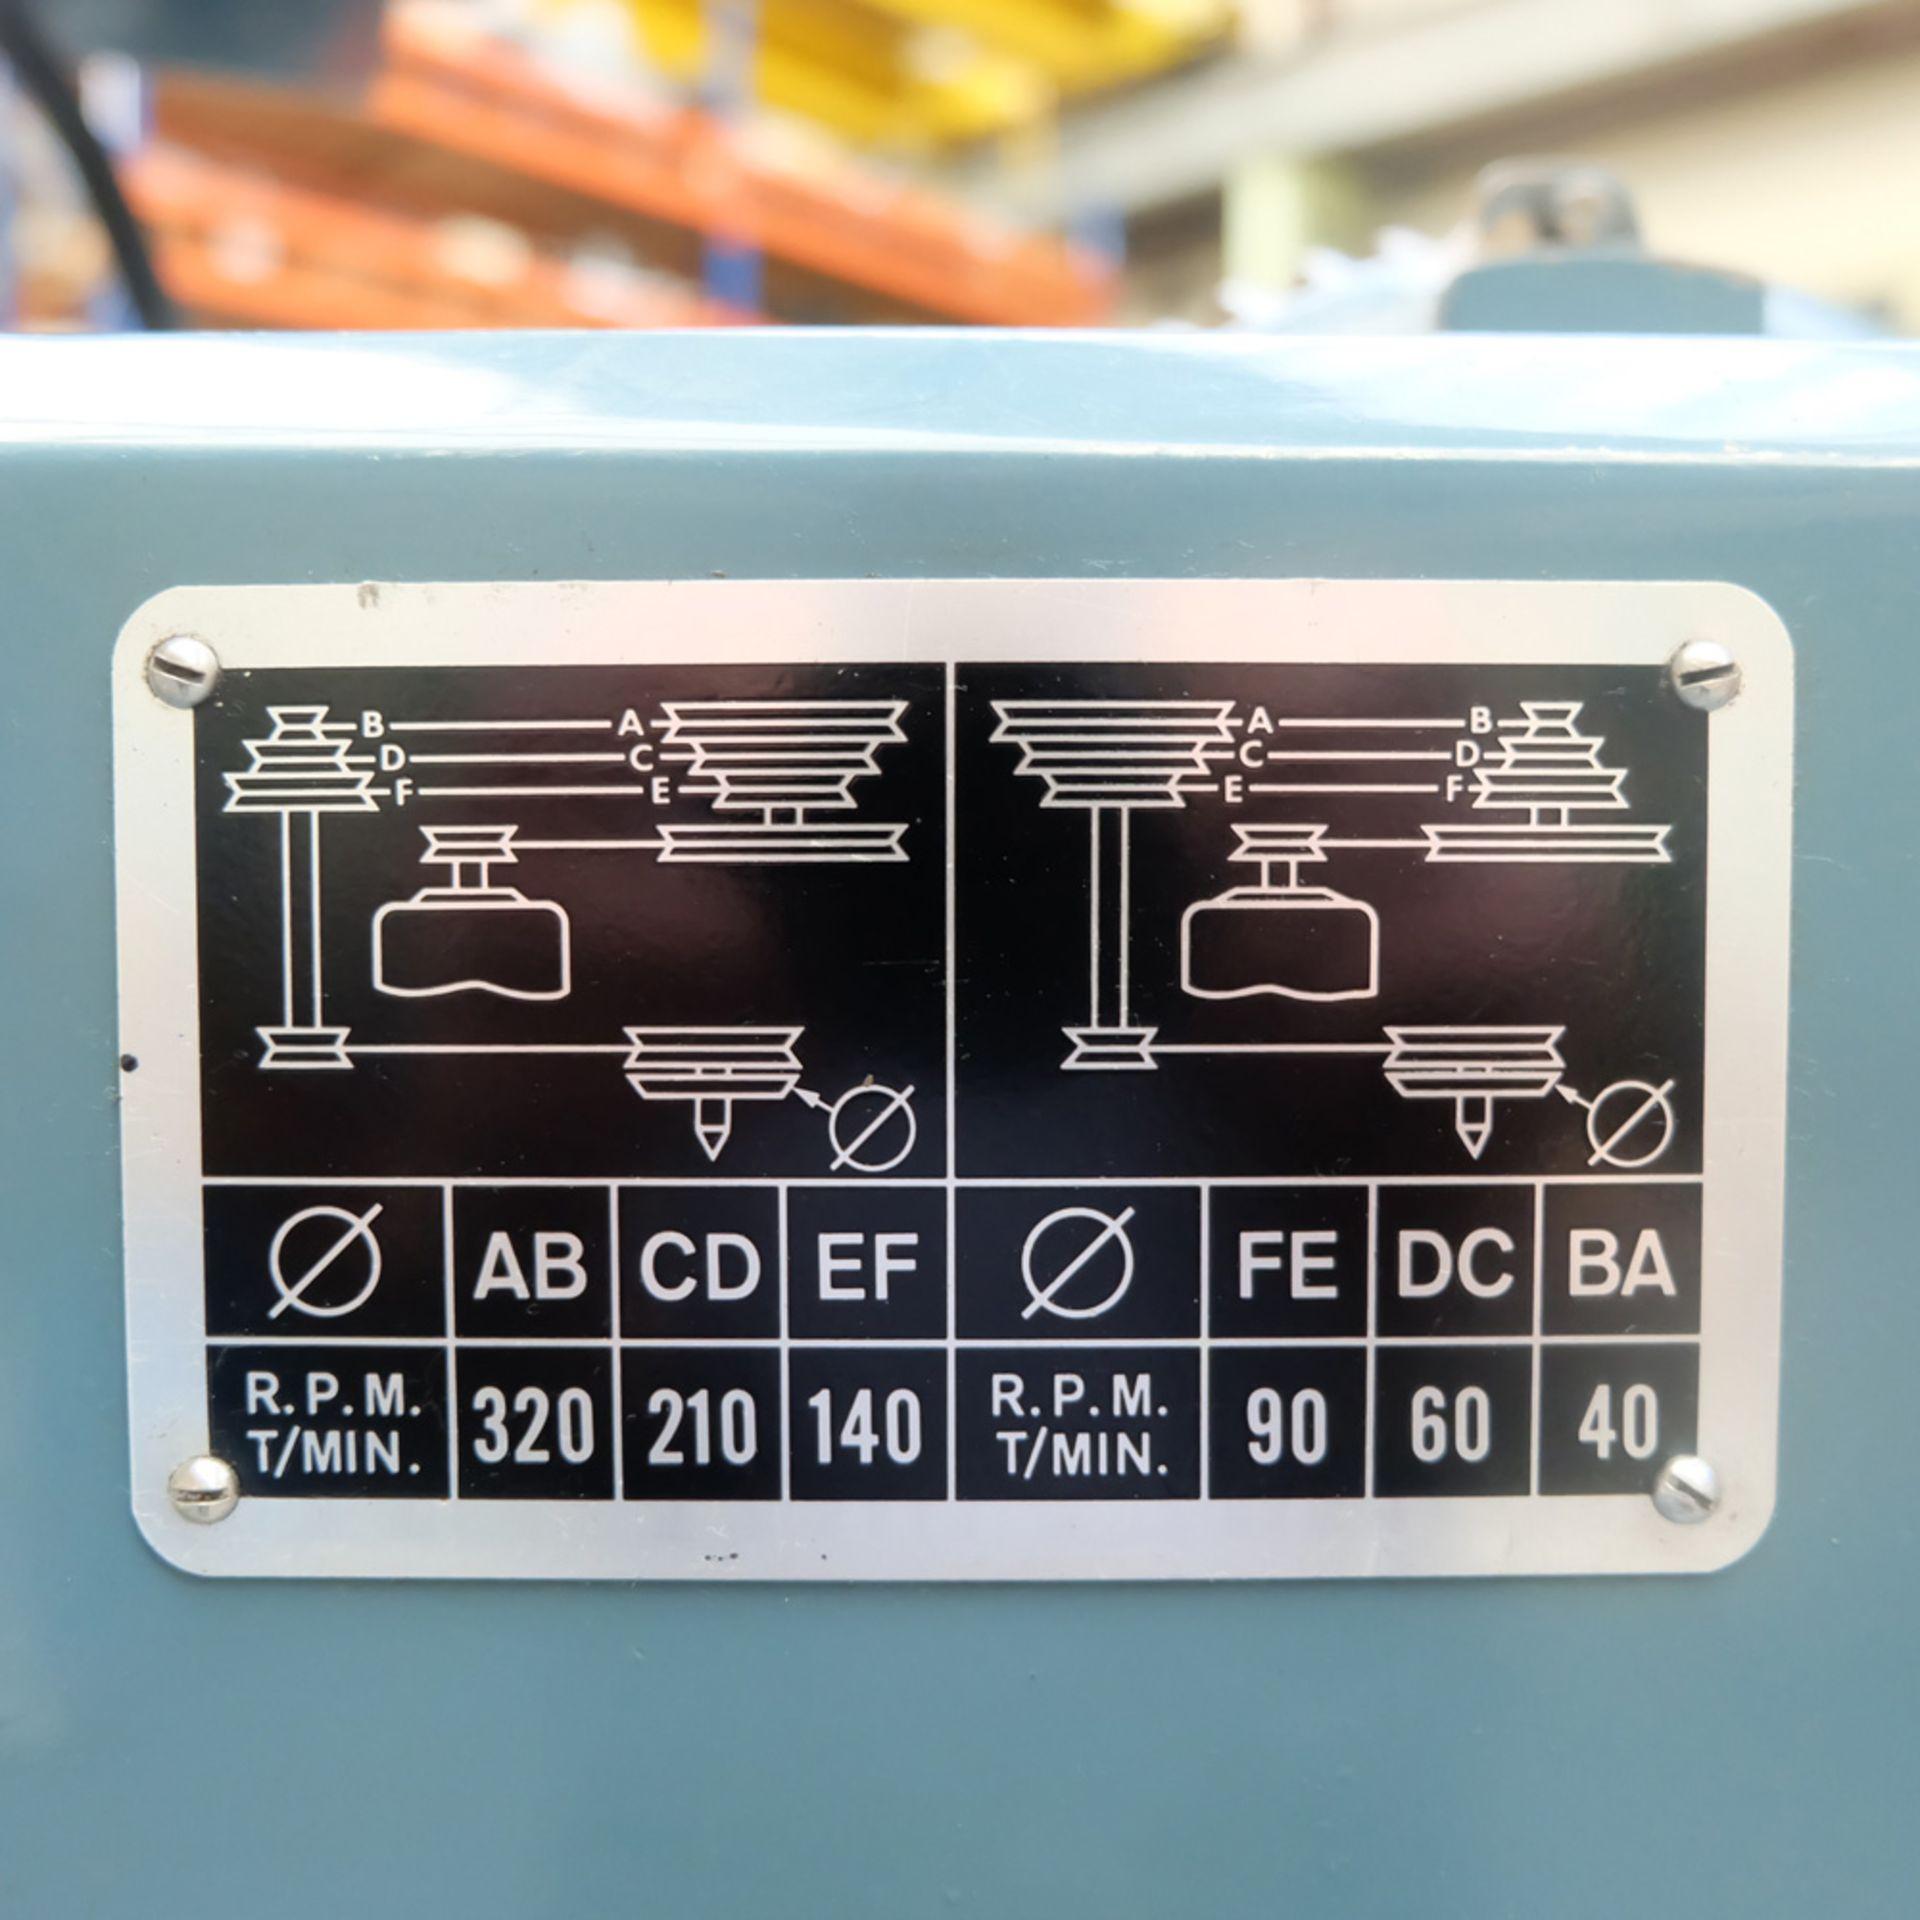 "Jones & Shipman Model 1311 EIU Universal Cylindrical Grinder. Capacity 18"" x 10"". - Image 10 of 12"